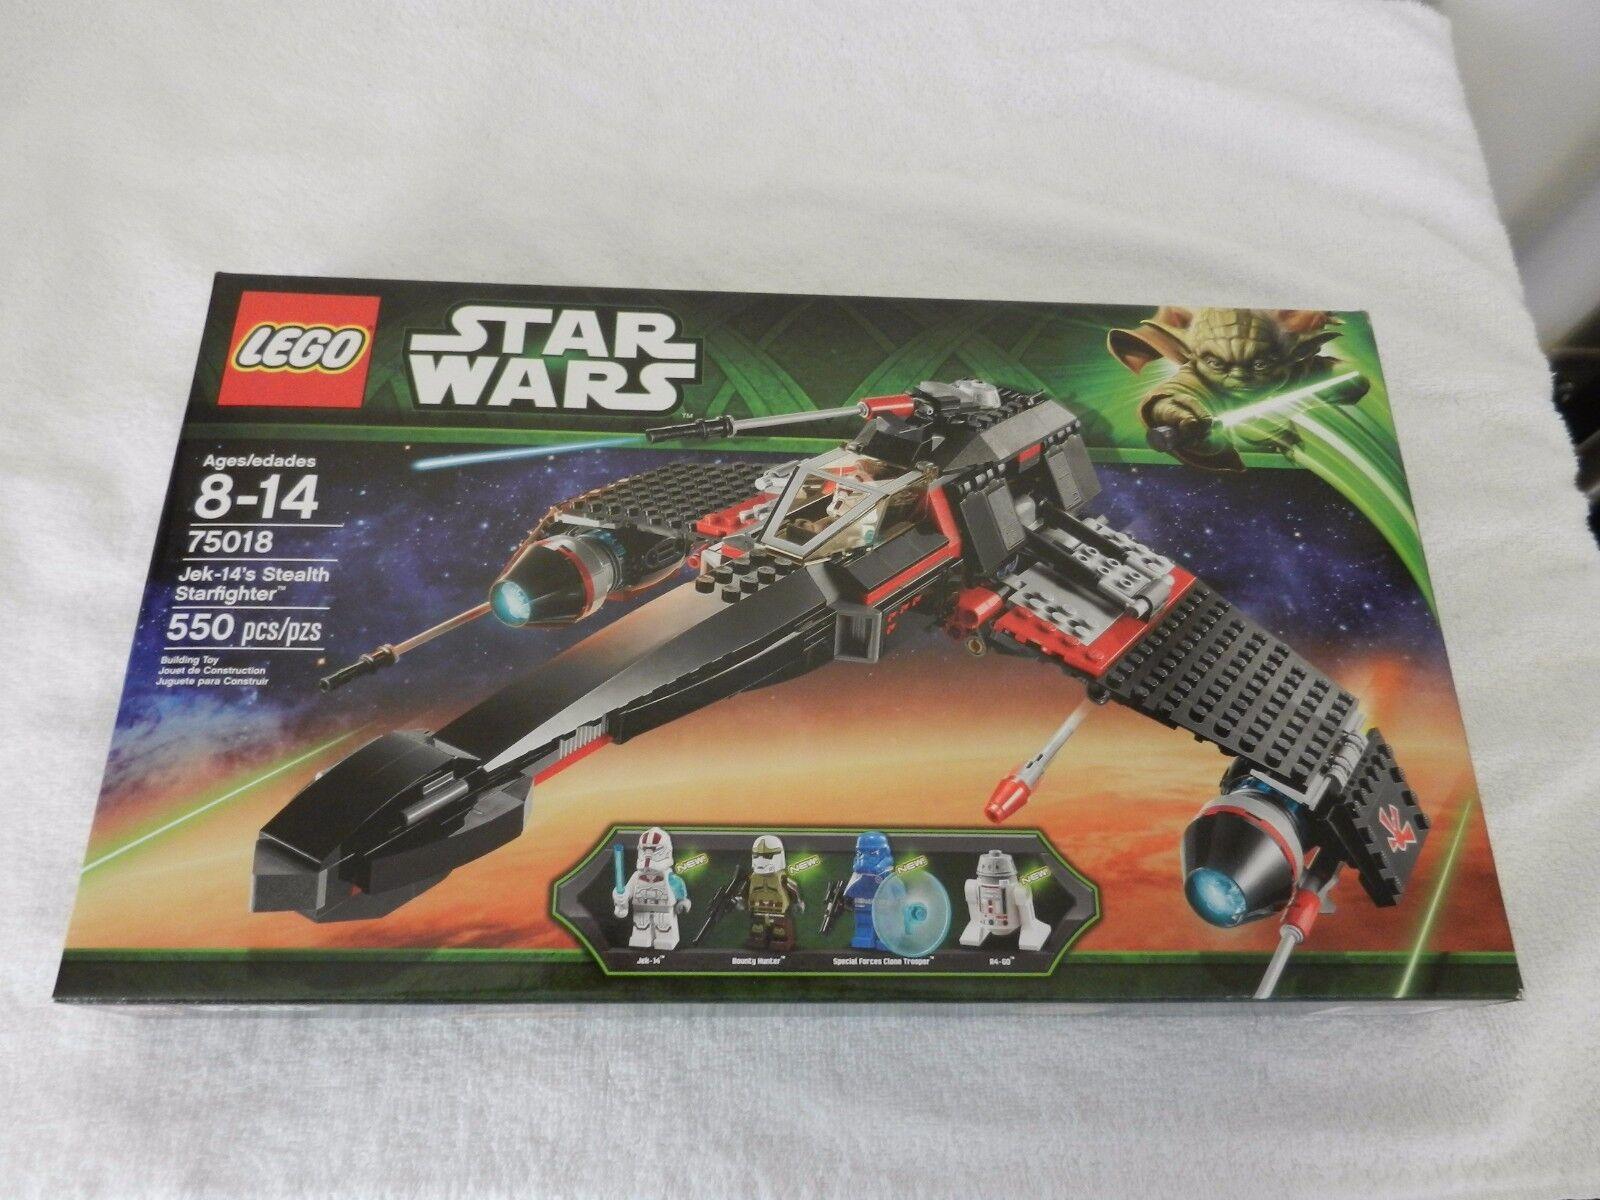 NEW LEGO STAR WARS JEK-14's Stealth Starfighter  pcs Factory Sealed